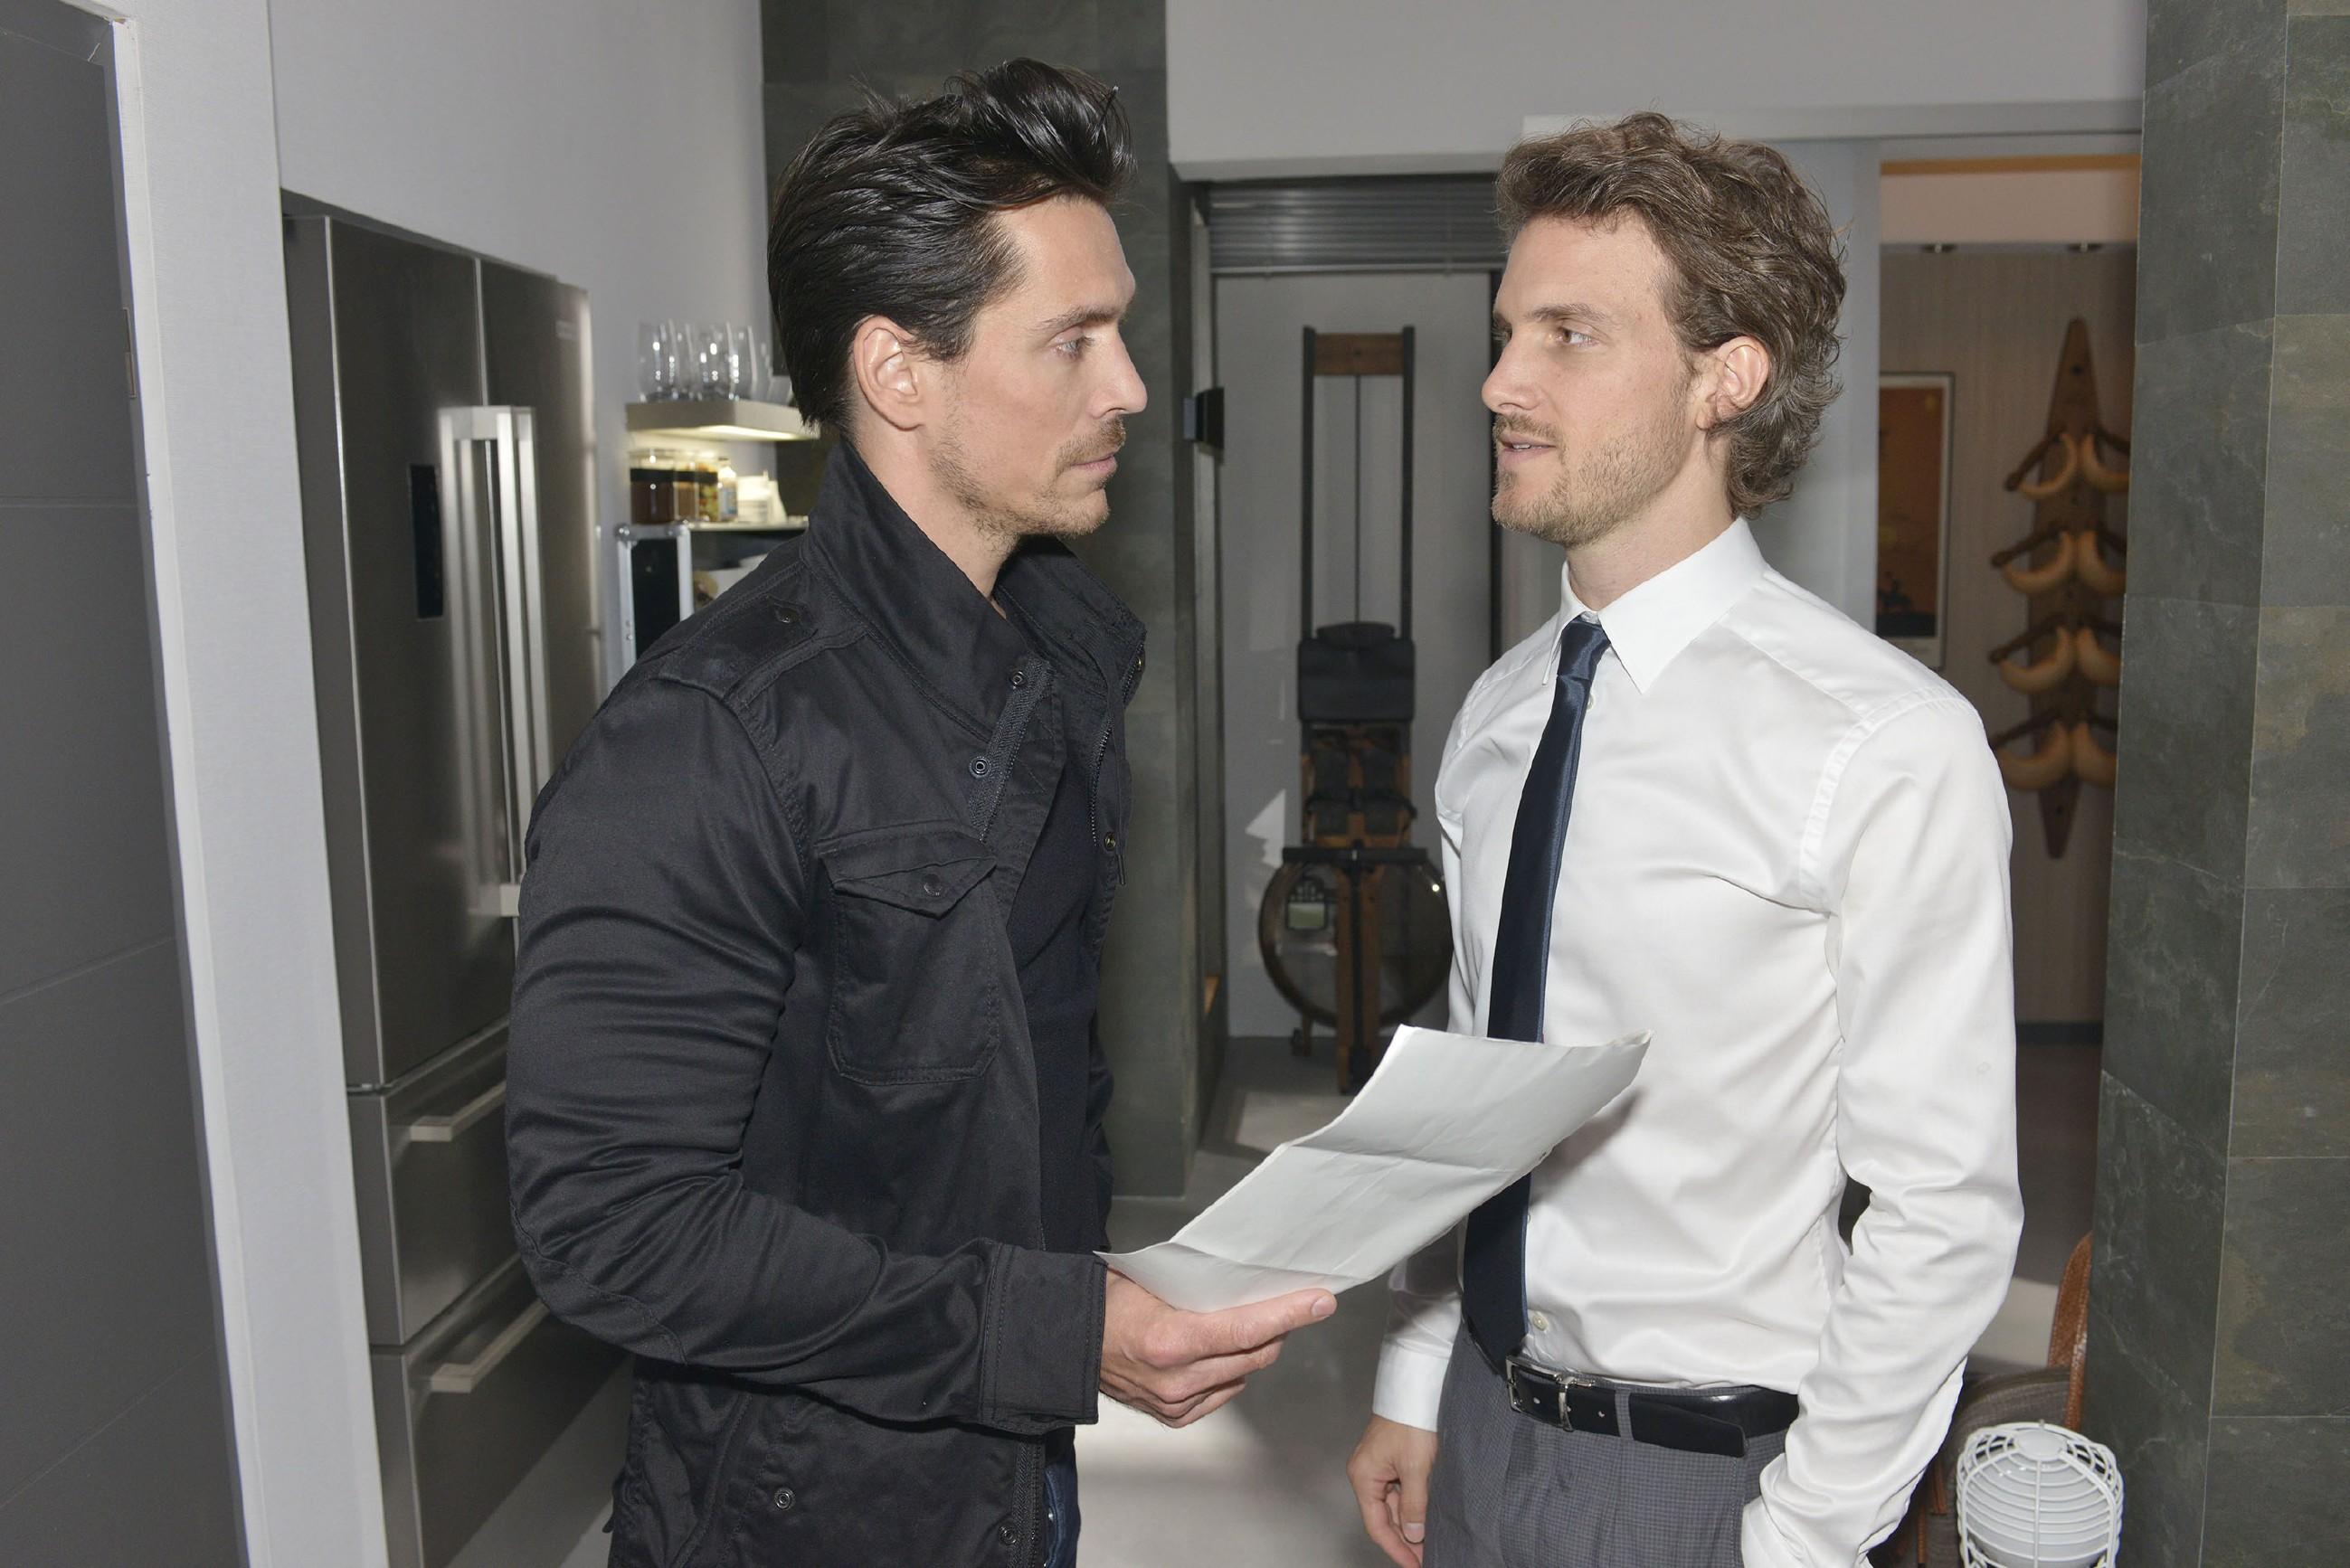 Als Felix (Thaddäus Meilinger) ihm einen todsicheren Insidertipp zuspielt, denkt David (Philipp Christopher, l.) über einen allerletzten Deal nach. (Quelle: RTL / Rolf Baumgartner)